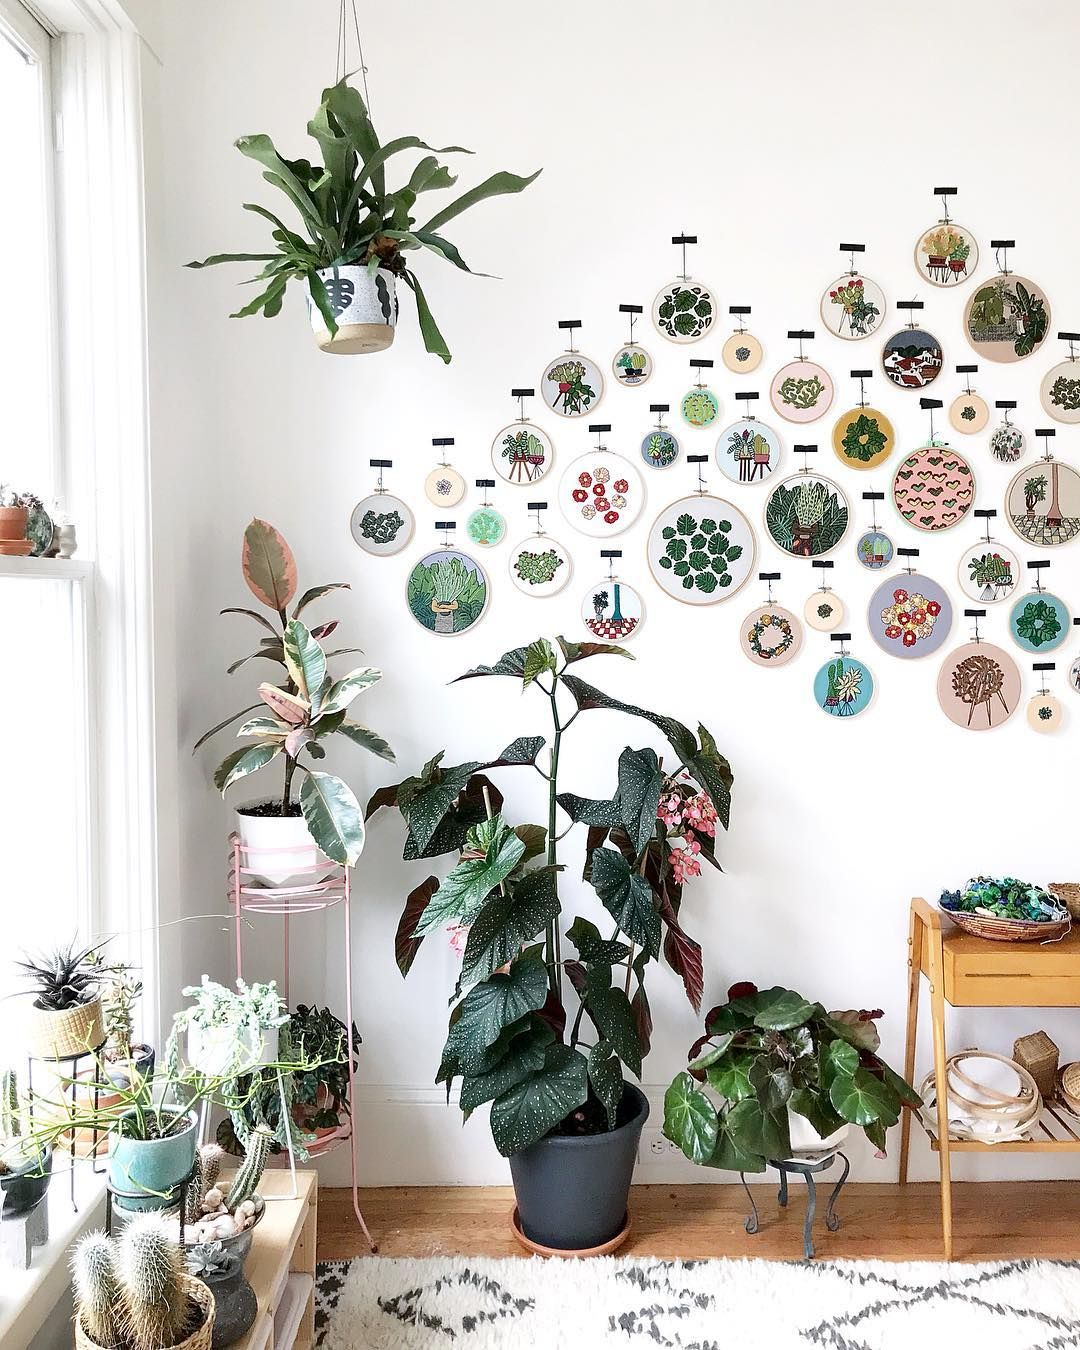 Pin by pnr sme on dekorasyon pinterest indoor garden